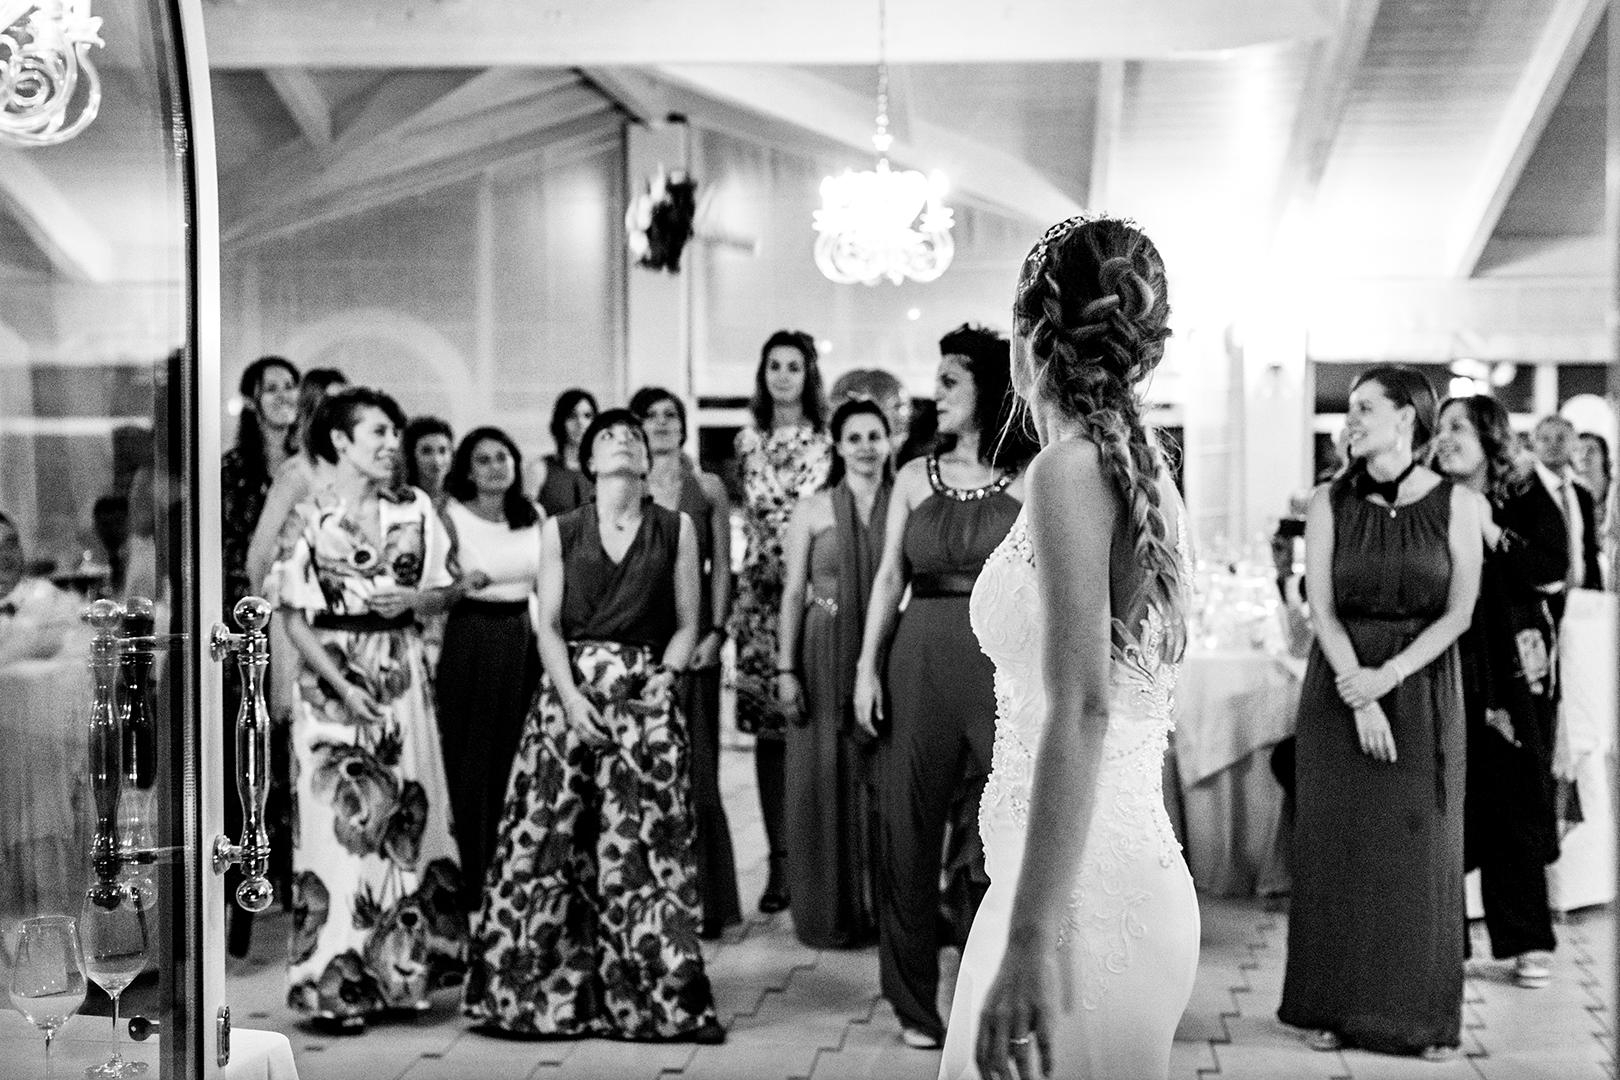 67 gianni-lepore-fotografo-matrimonio-lancio-bouquet-sposa-bride-bianco-nero